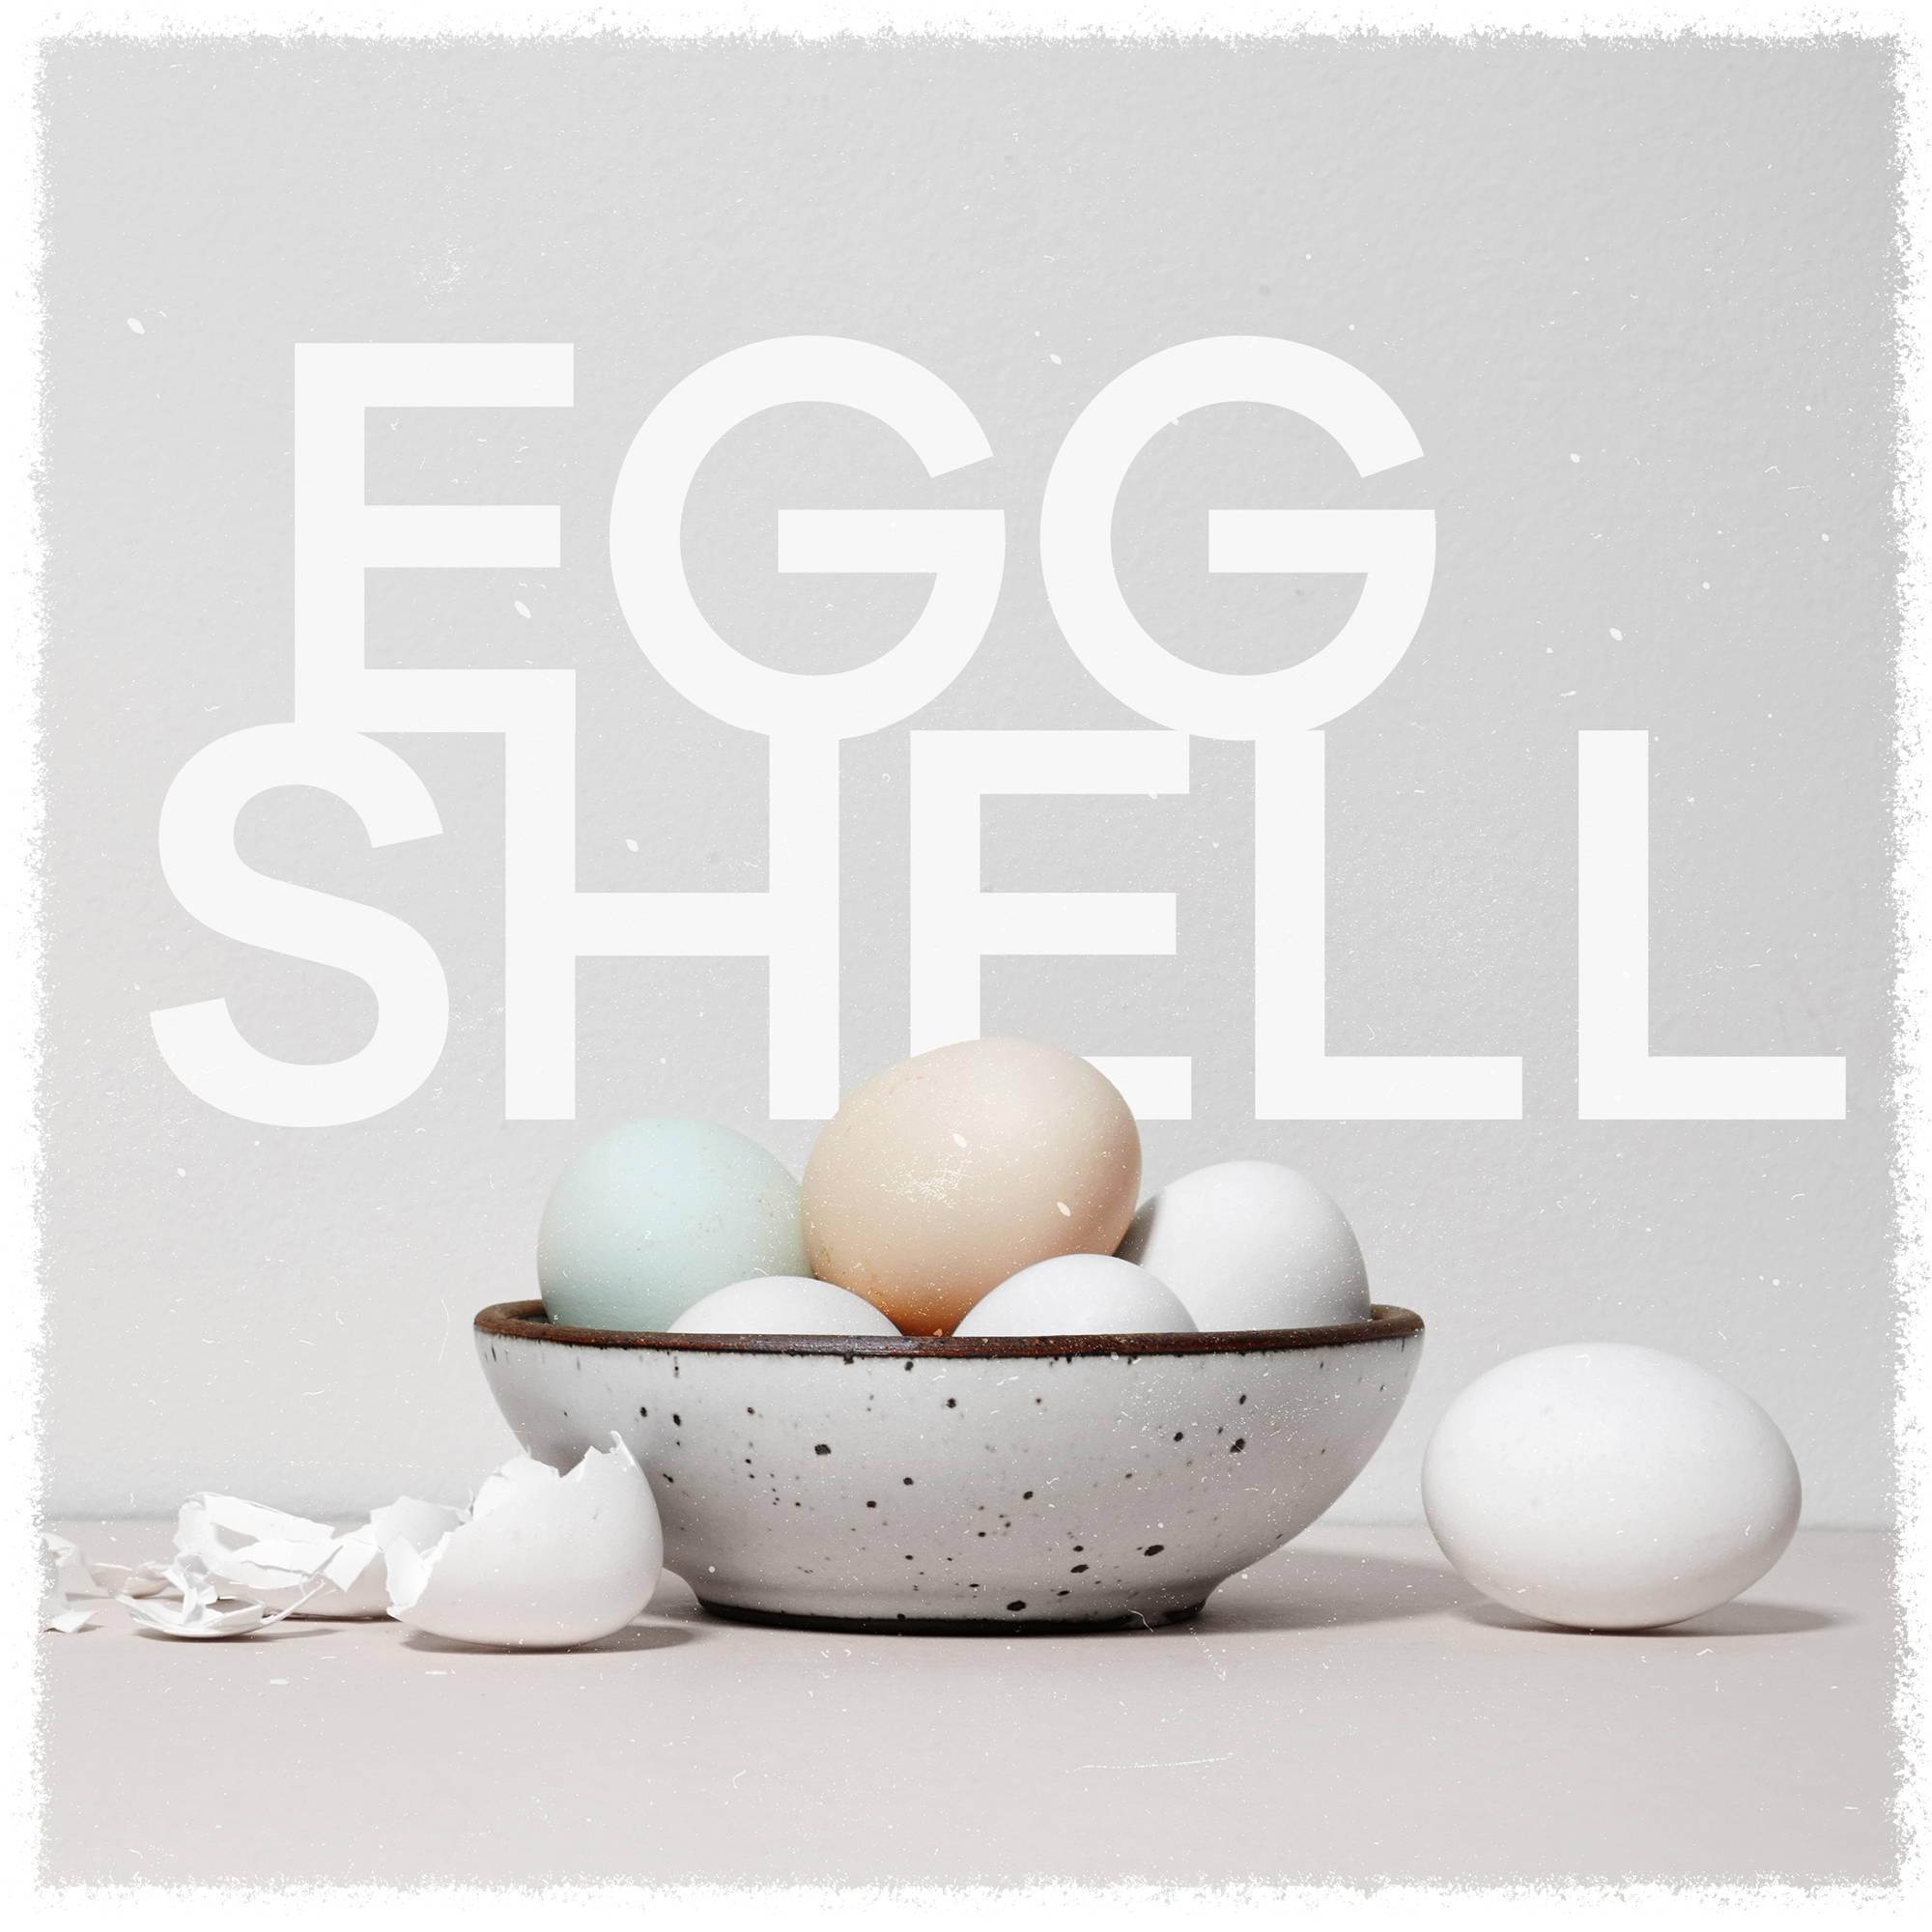 Eggshell Playlist on Spotify